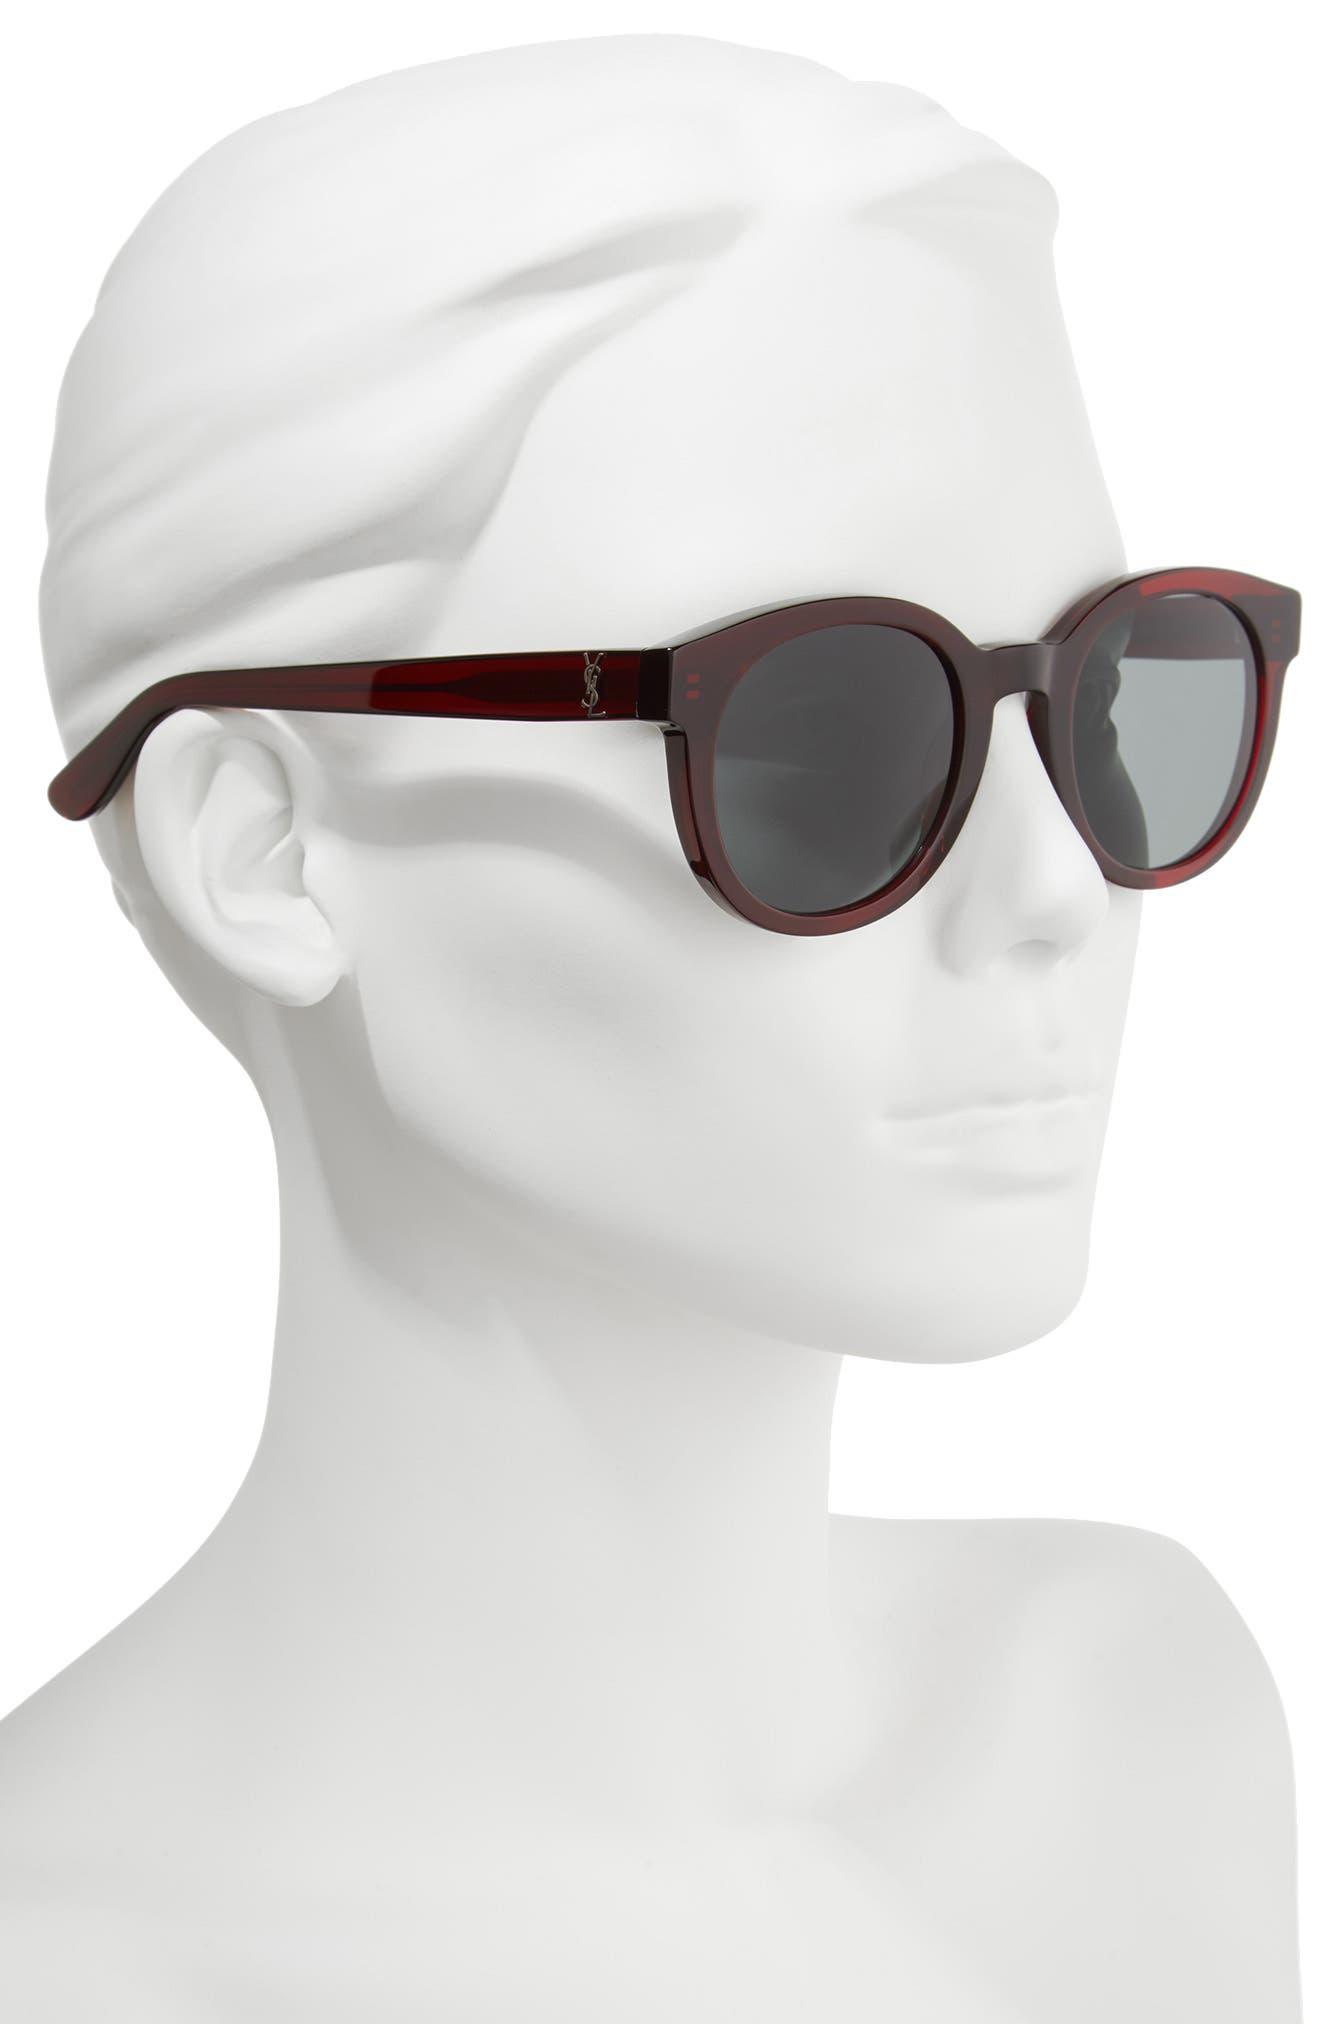 51mm Round Sunglasses,                             Alternate thumbnail 2, color,                             600